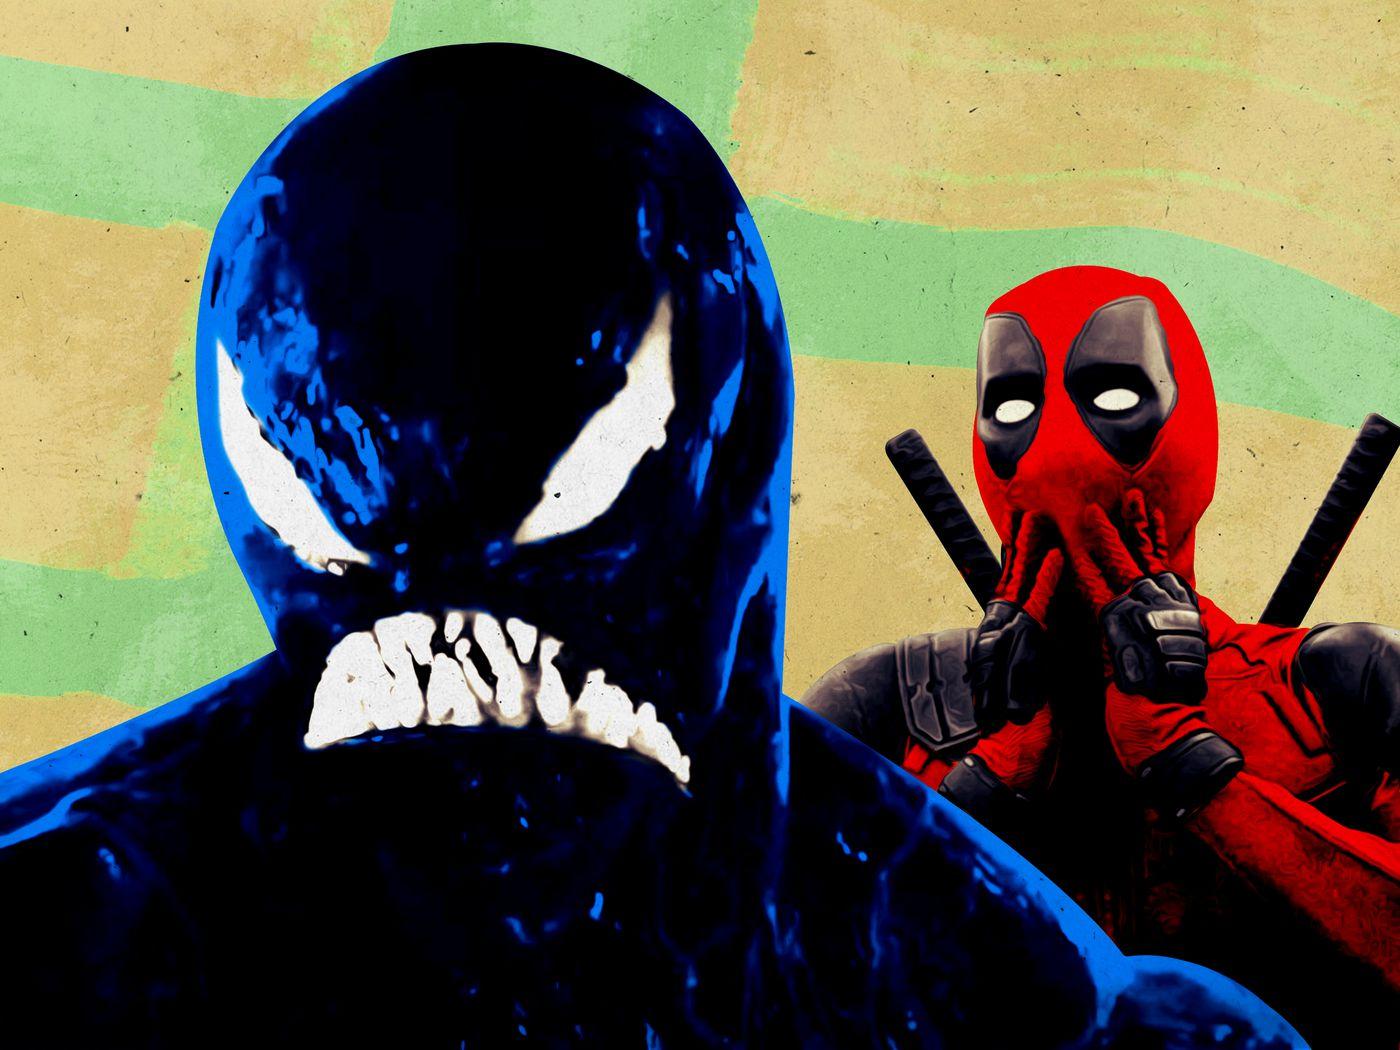 Venom Should Have Been More Like Deadpool The Ringer